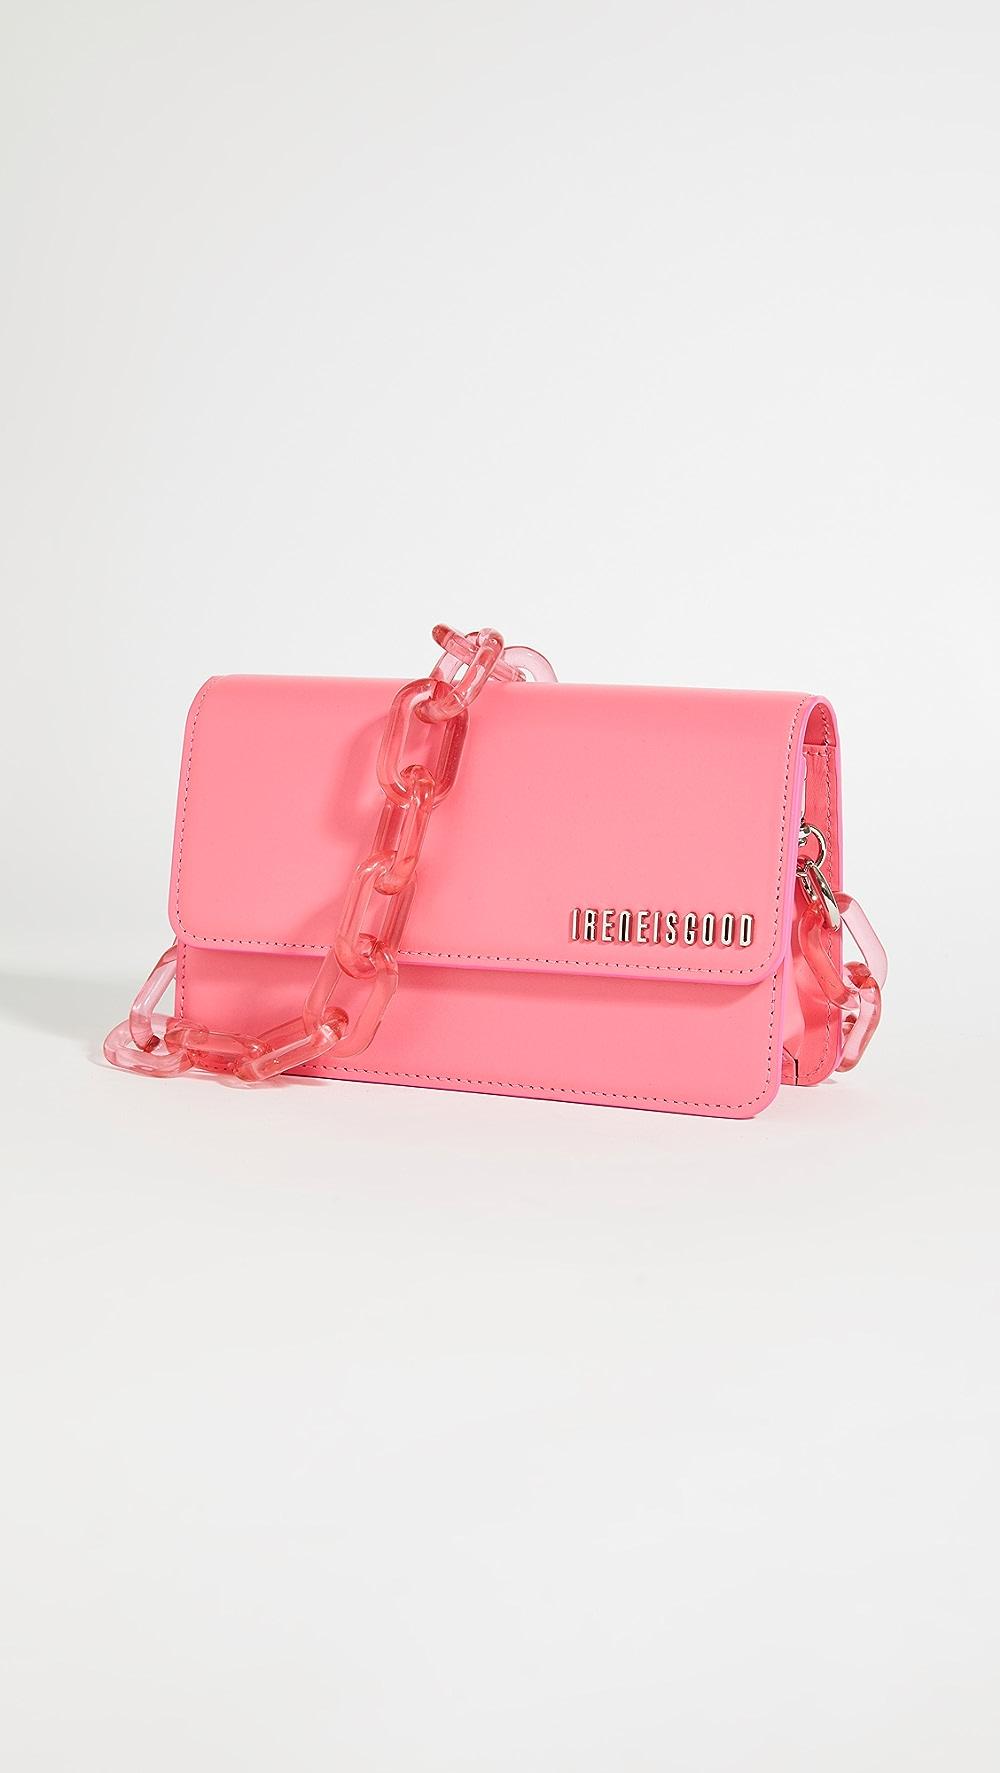 100% Quality Ireneisgood - Mini Bag Pleasant To The Palate